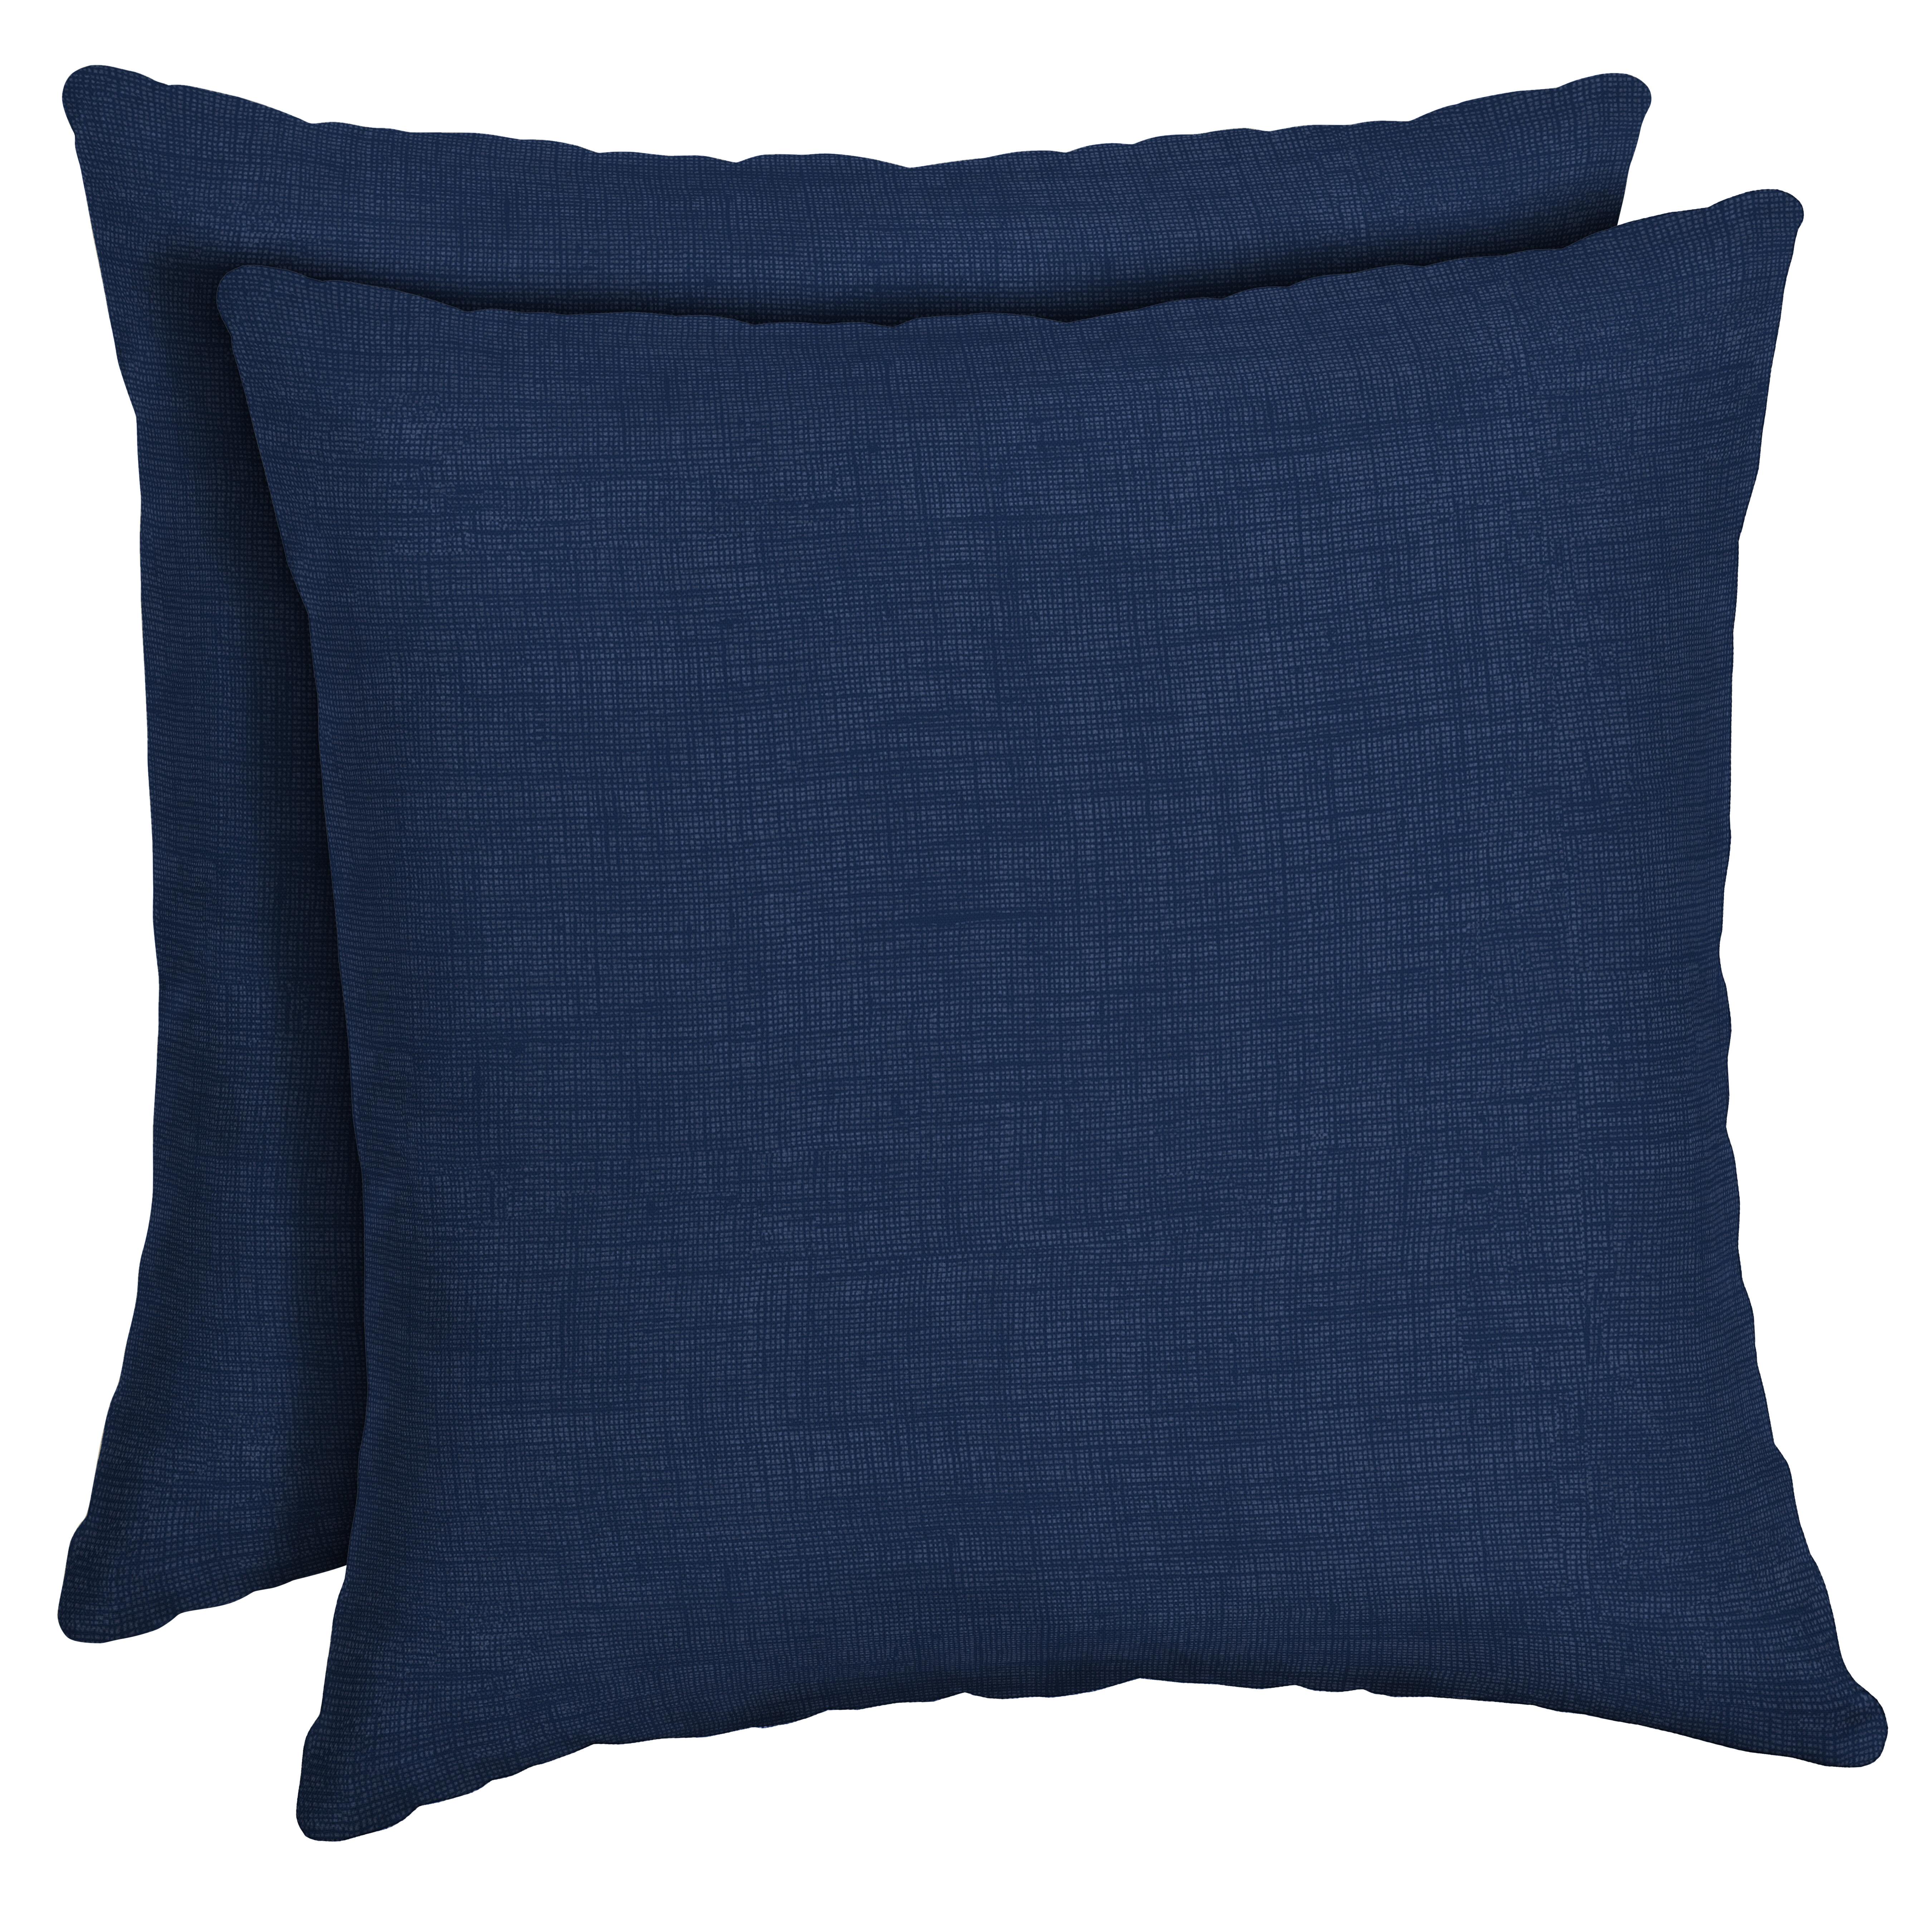 decorative boho accent unique pretty patchwork 16x16.htm throw pillows   decorative pillows you ll love in 2020  throw pillows   decorative pillows you